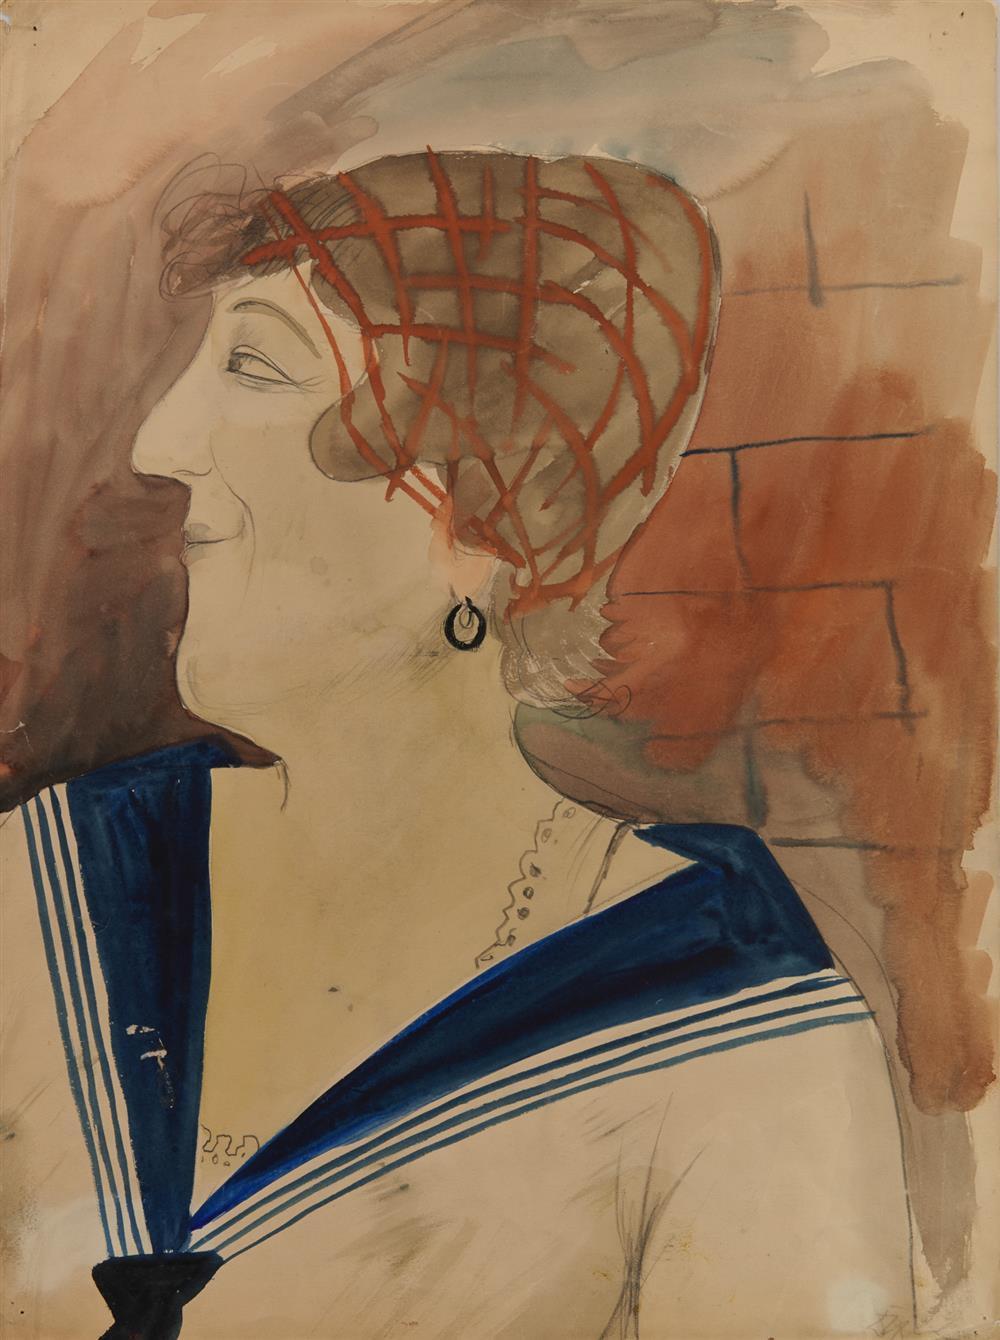 OTTO DIX, (German, 1891-1969), Portrait of Julia Feininger, watercolor and pencil, 1922, 19 1/2 x 14 1/4 in.